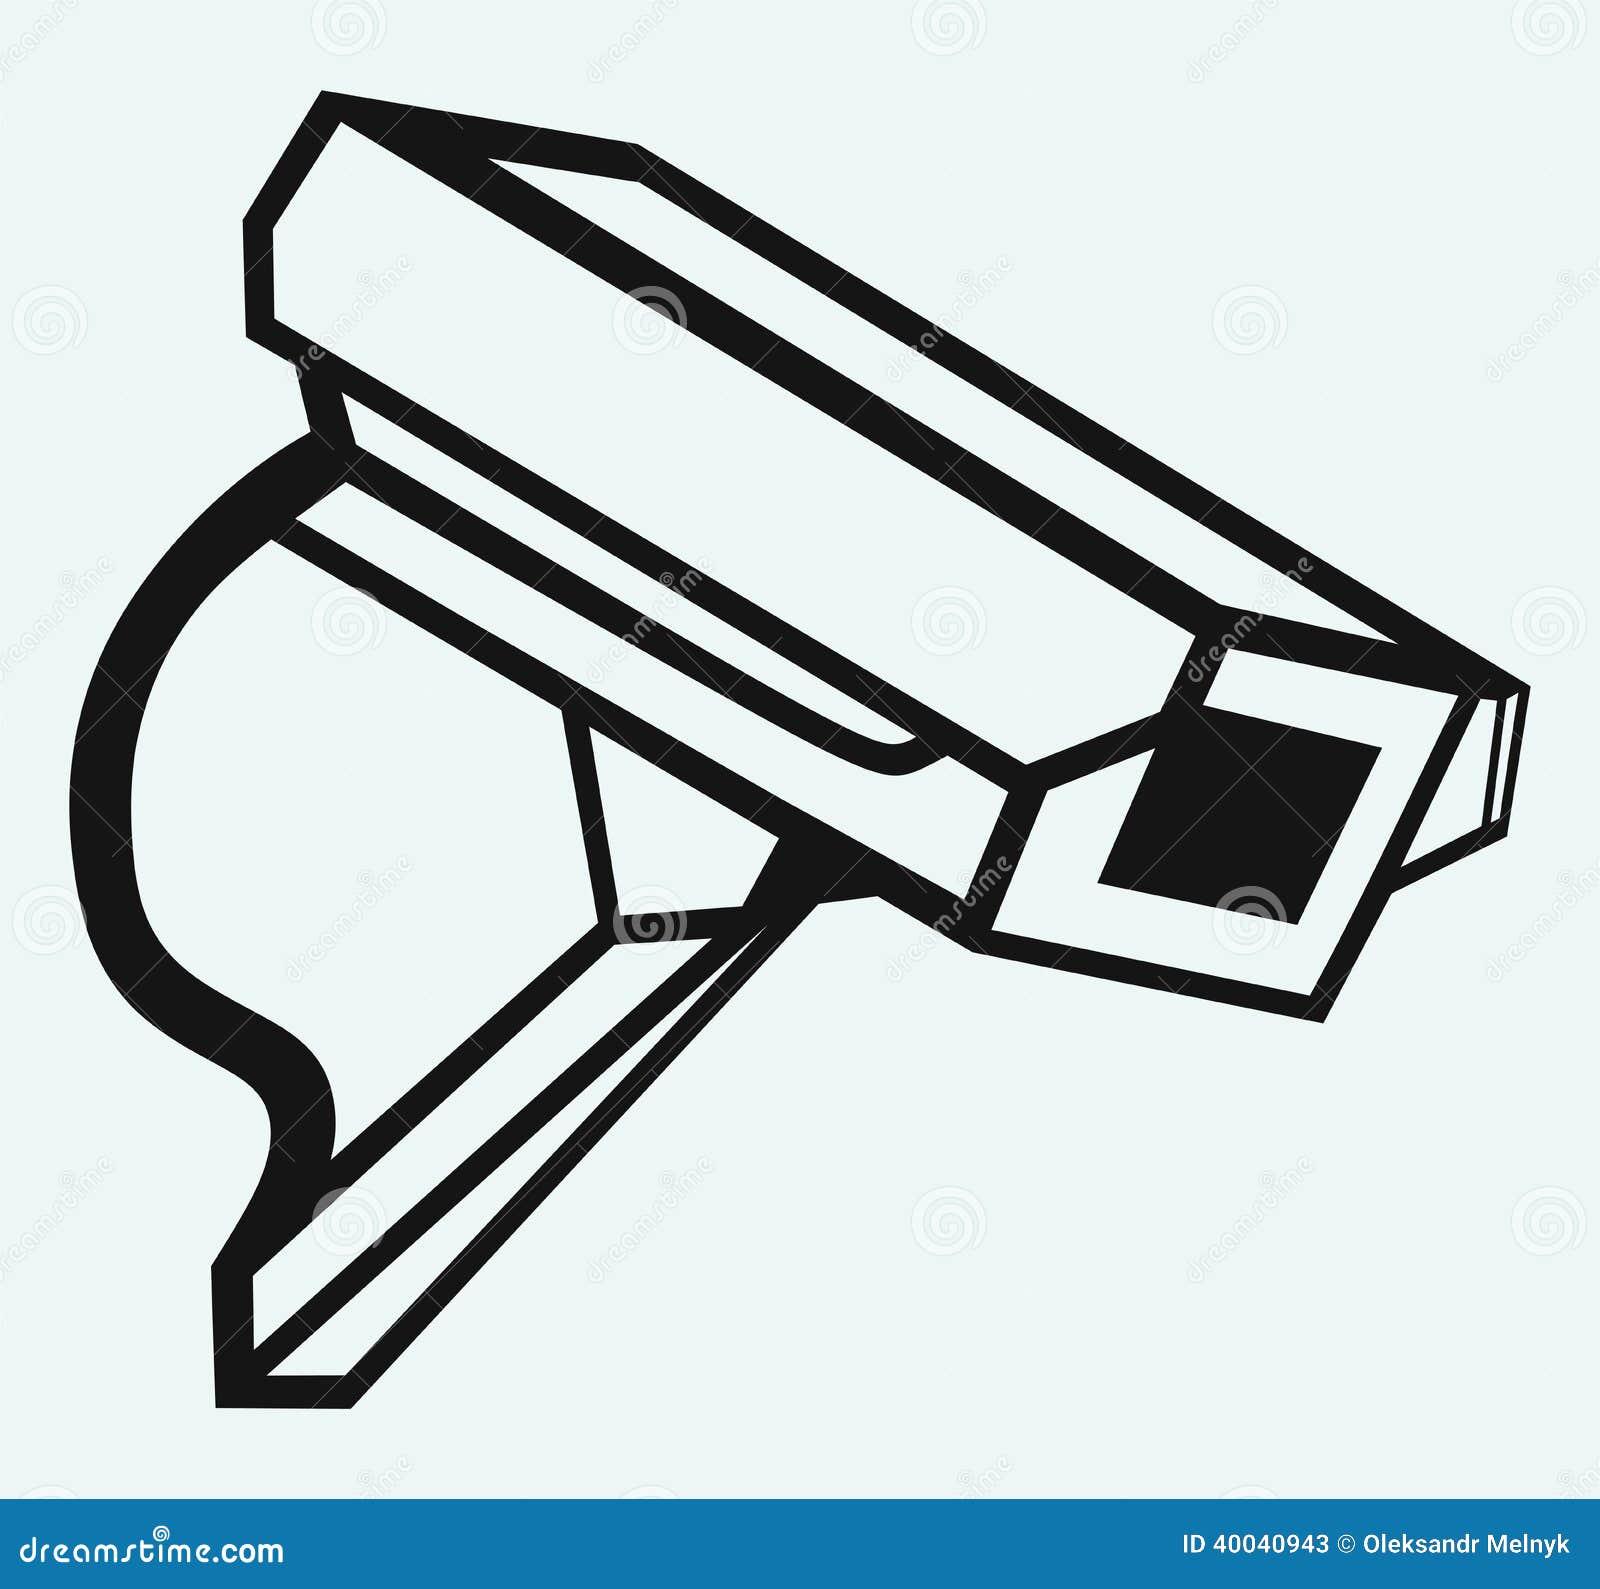 berwachungskamera im freien vektor abbildung bild 40040943. Black Bedroom Furniture Sets. Home Design Ideas